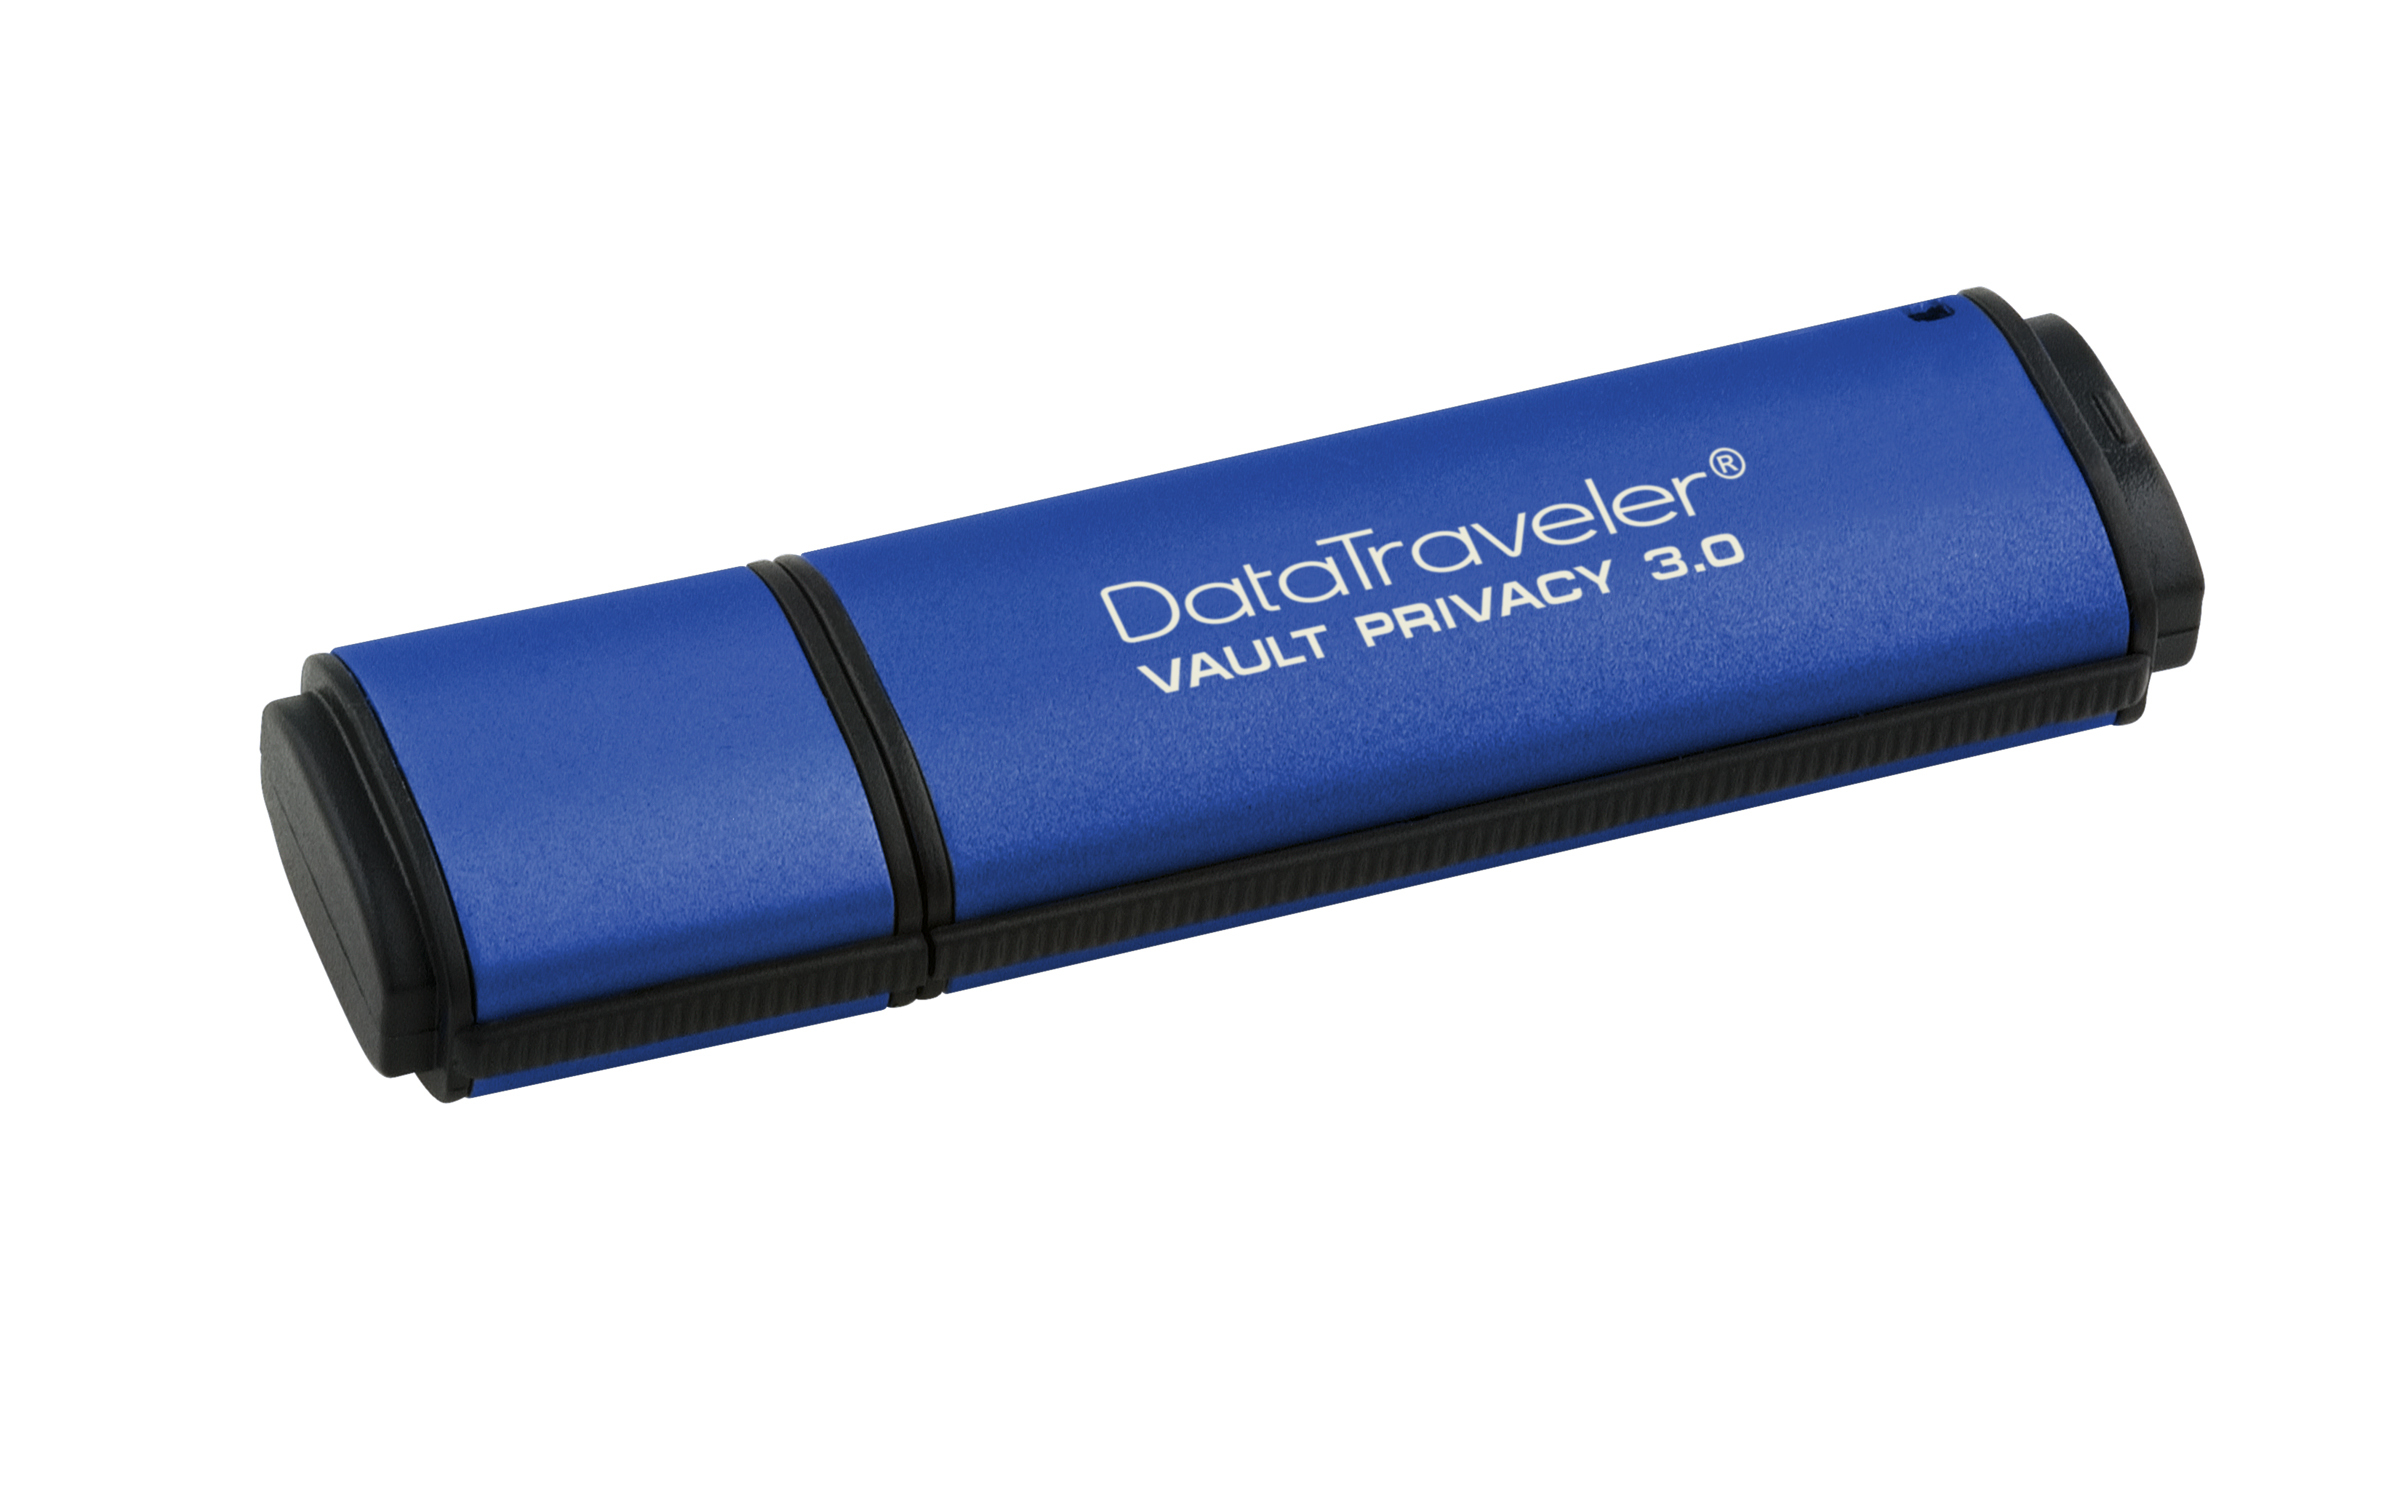 DTVP30 USB-Stick 4 GB (256-bit AES Encrypted, USB 3.0)